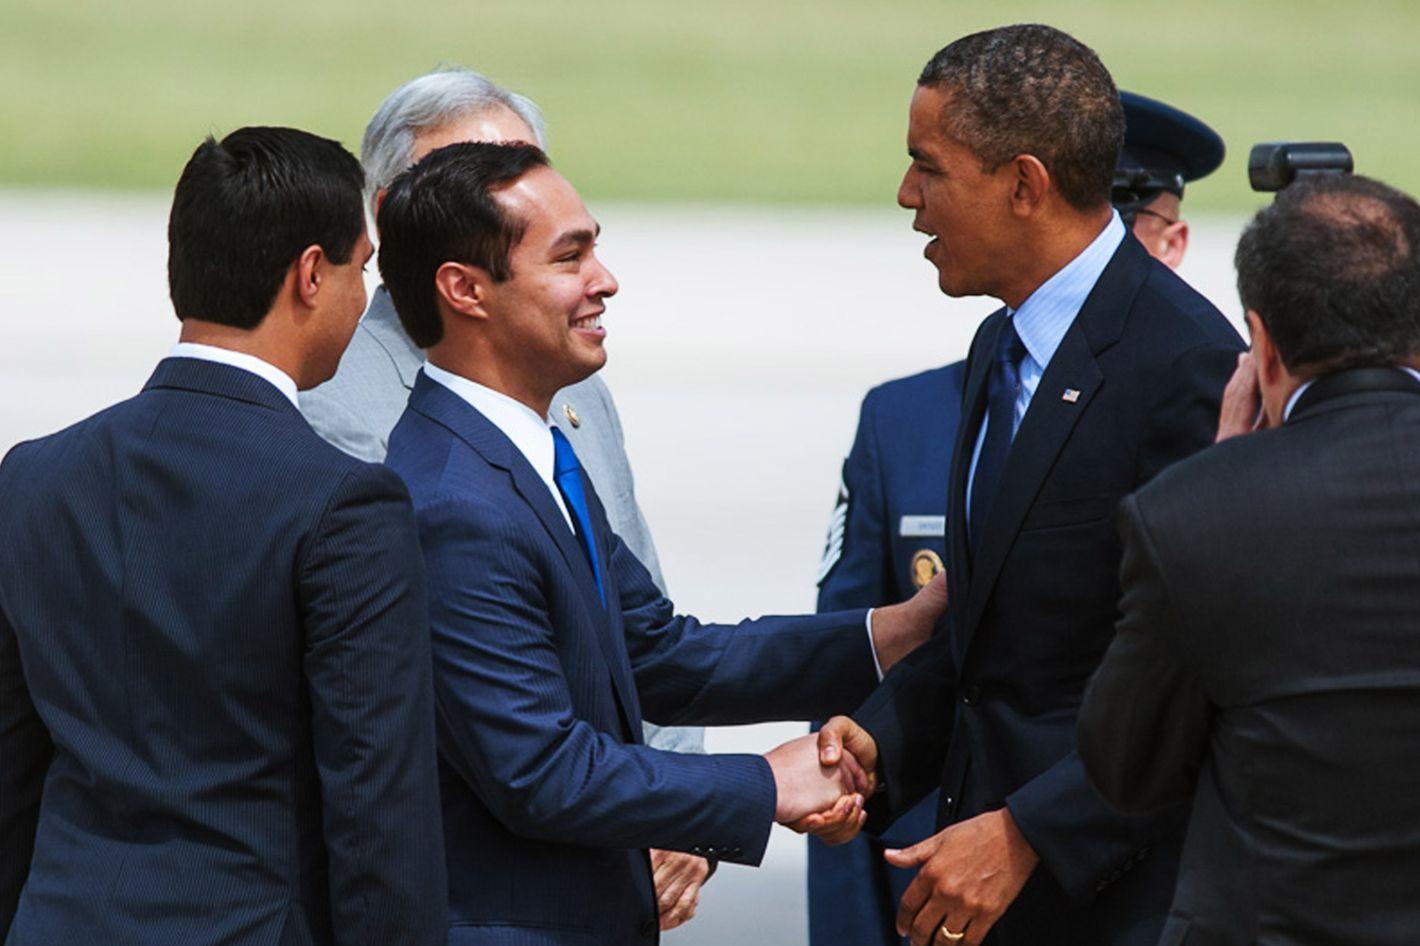 President Barack Obama is greeted by San Antonio Mayor Julian Castro upon his arrival Tuesday, July 17, 2012  in San Antonio. (AP Photo/Bahram Mark Sobhani)